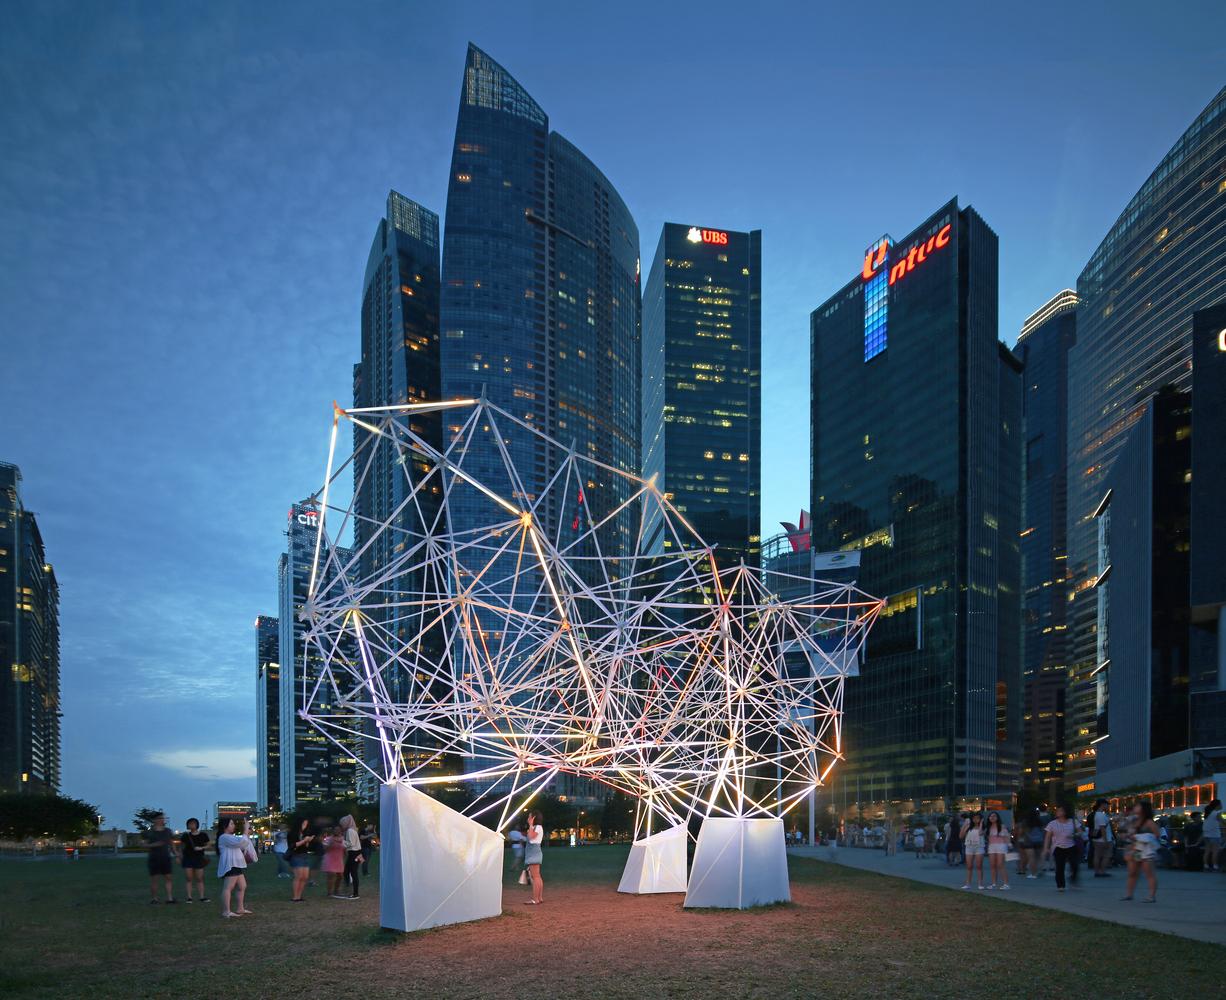 Parametrically designed Illuminated 3D printed Installation